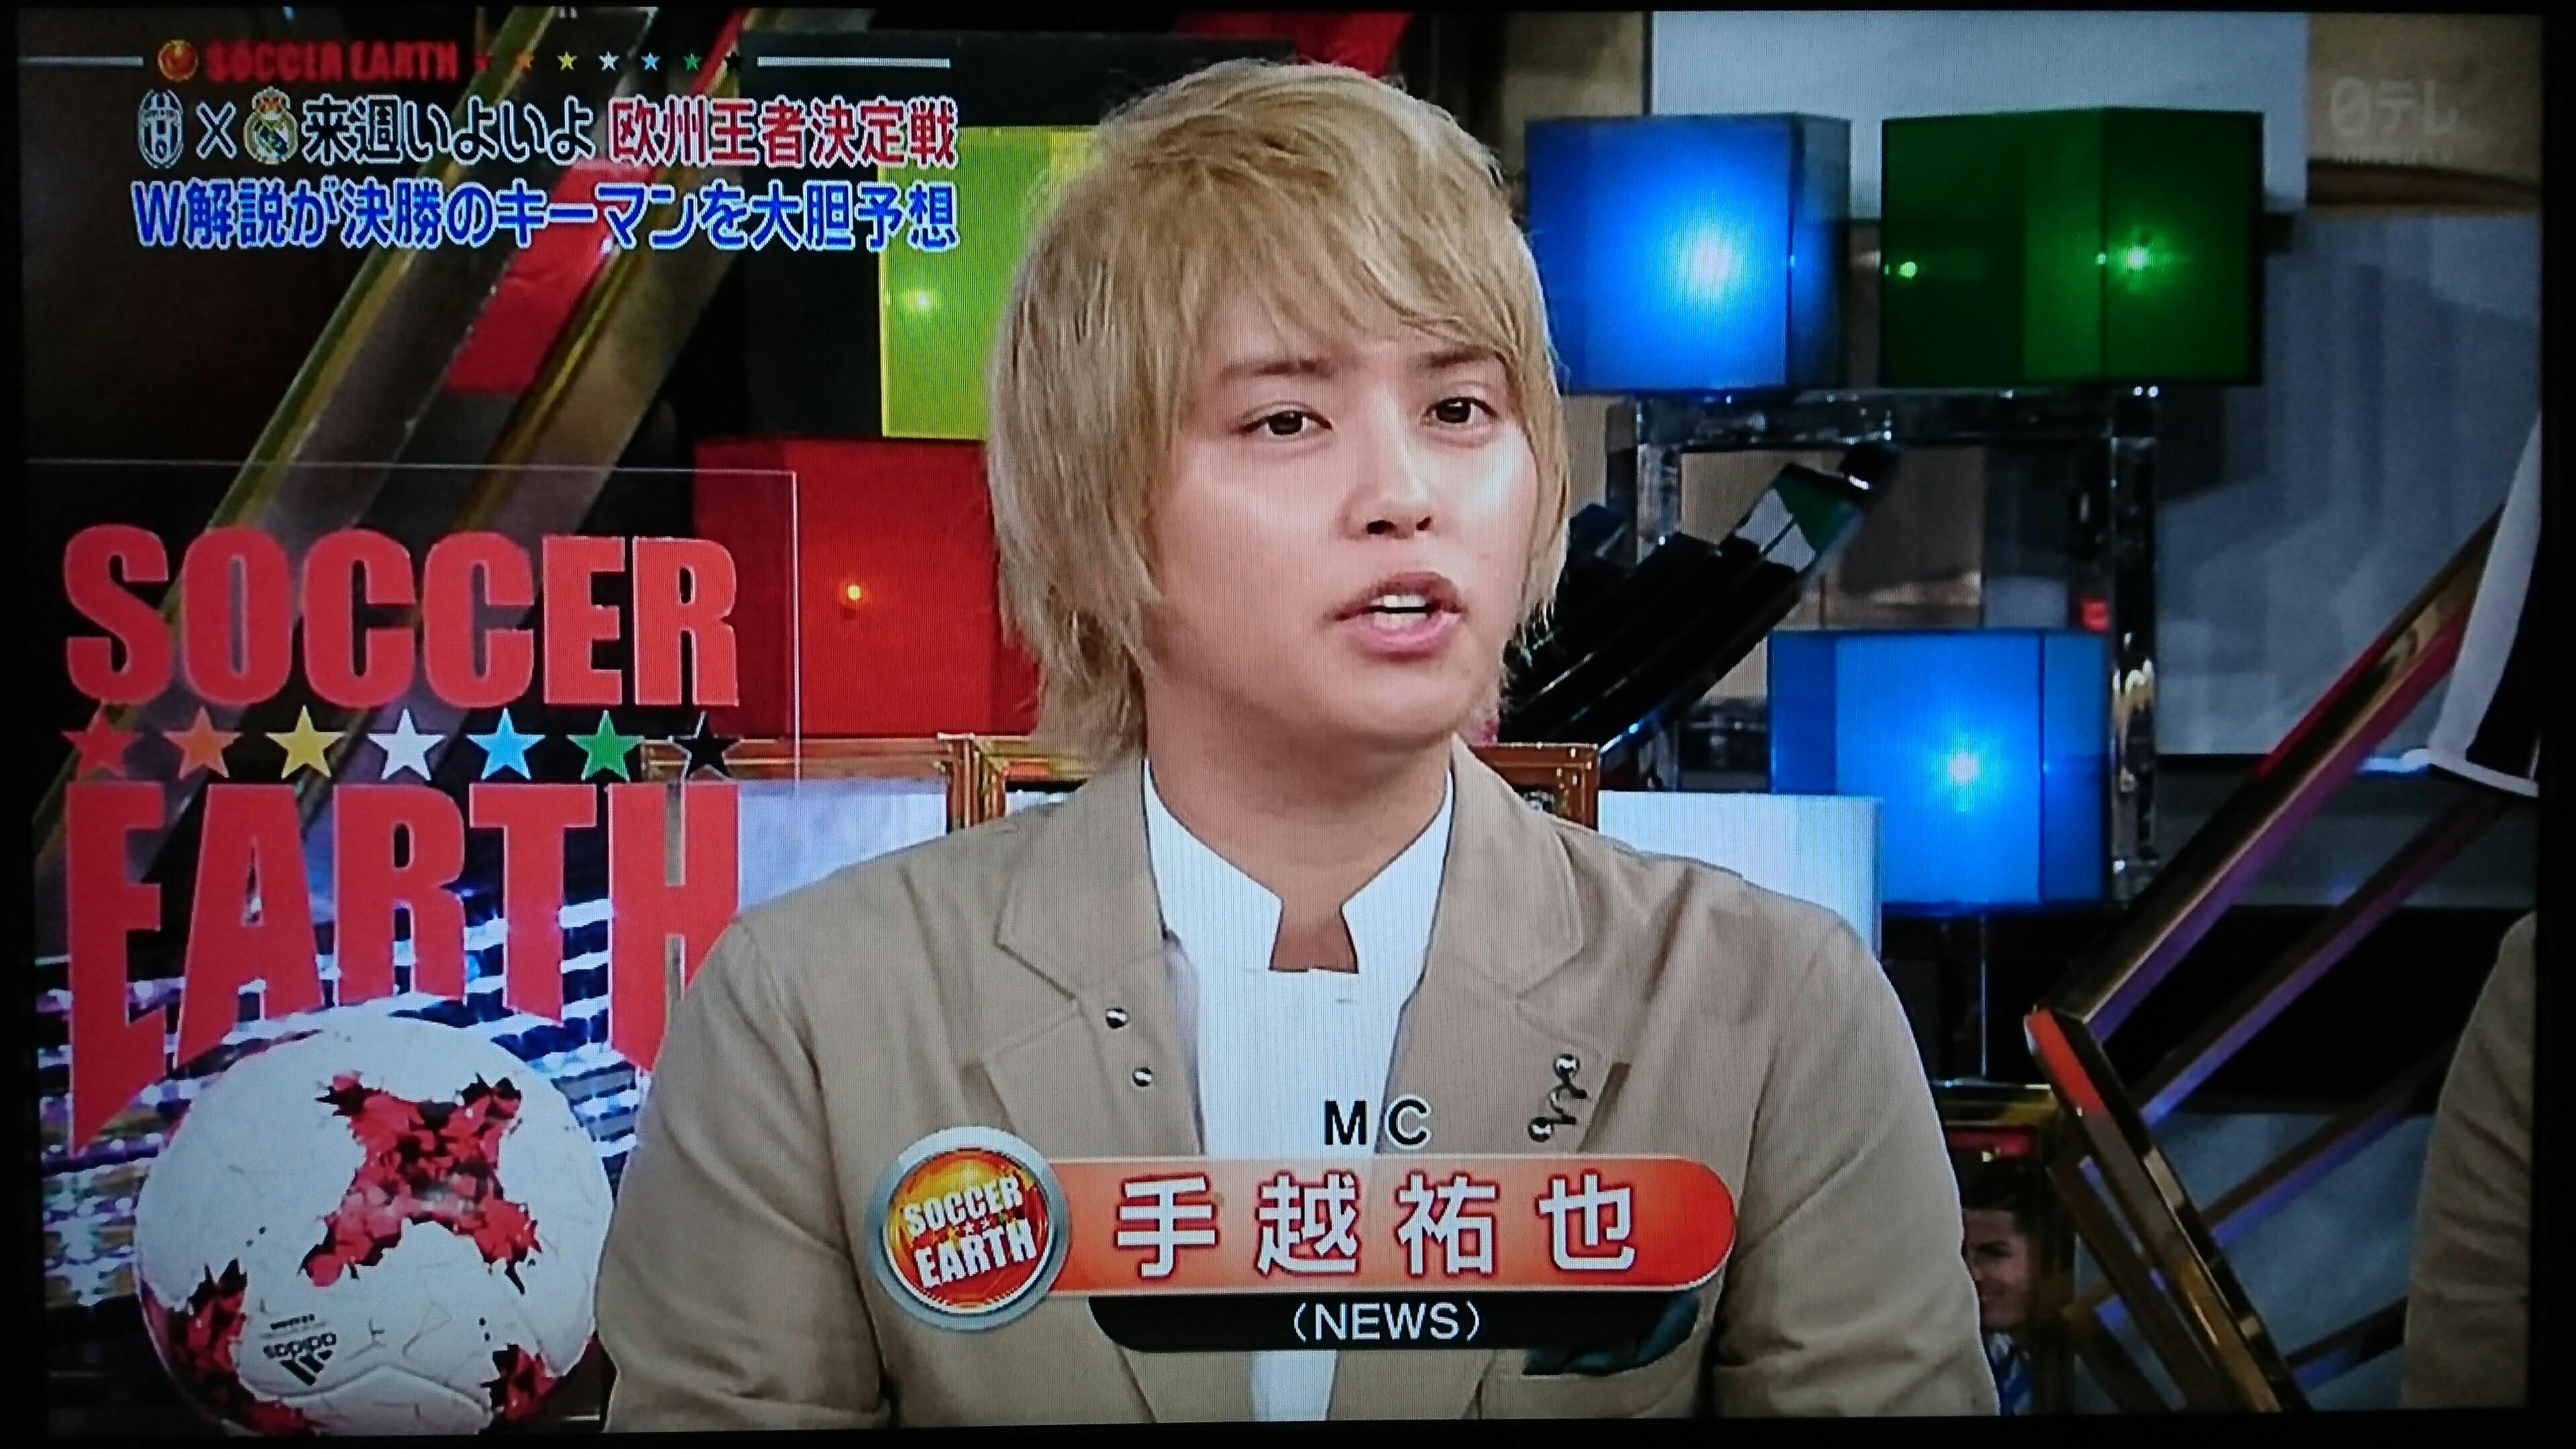 f:id:sunflower-shigeaki:20170528224950j:image